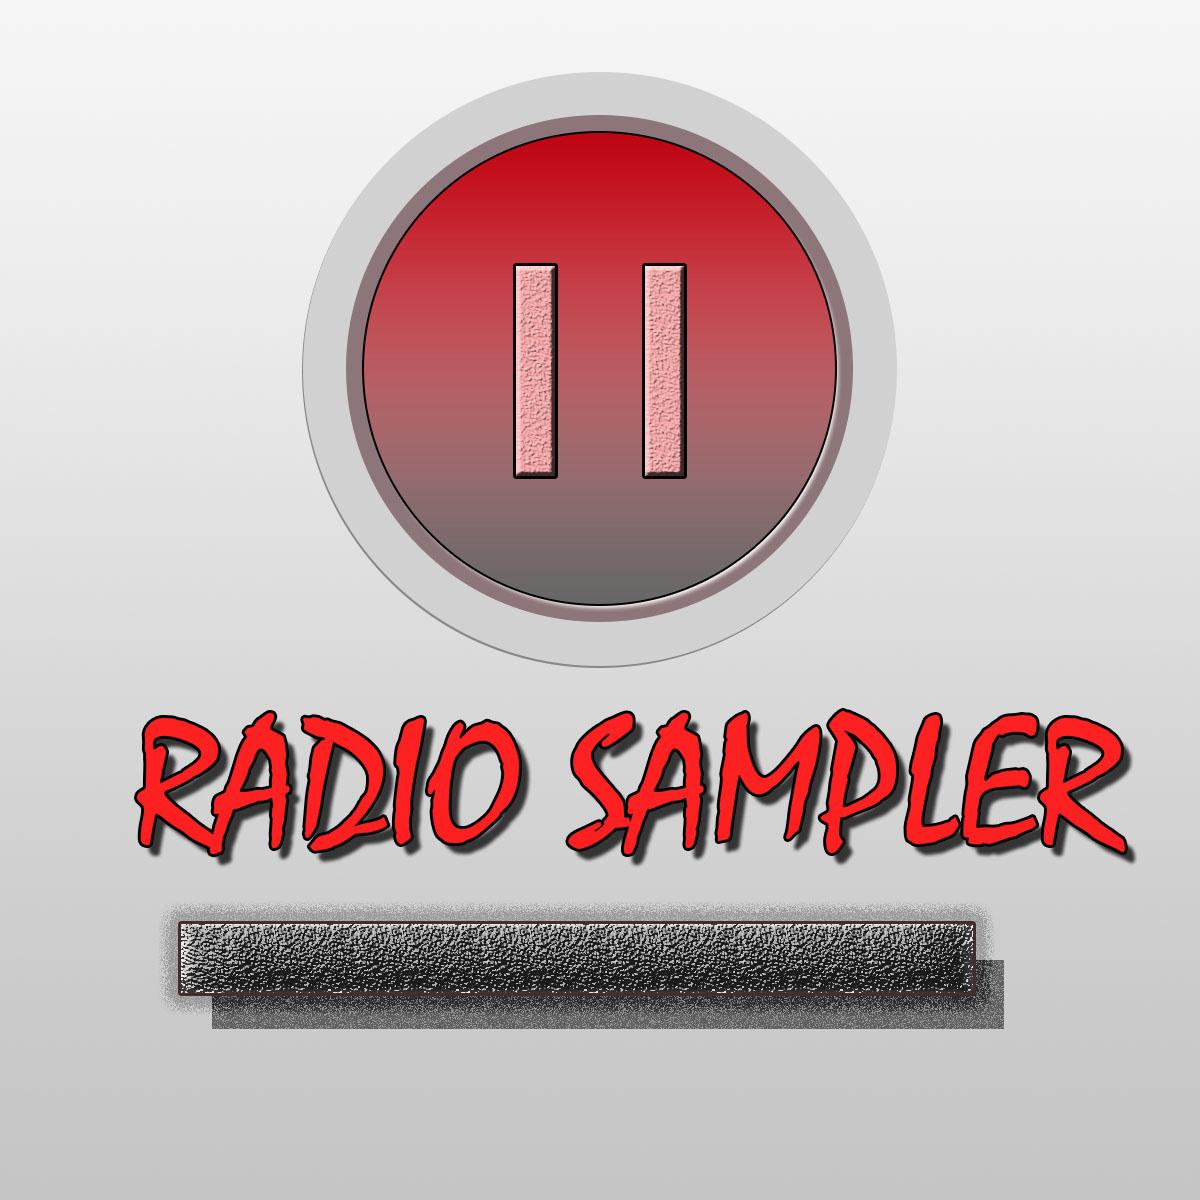 Radio Sampler